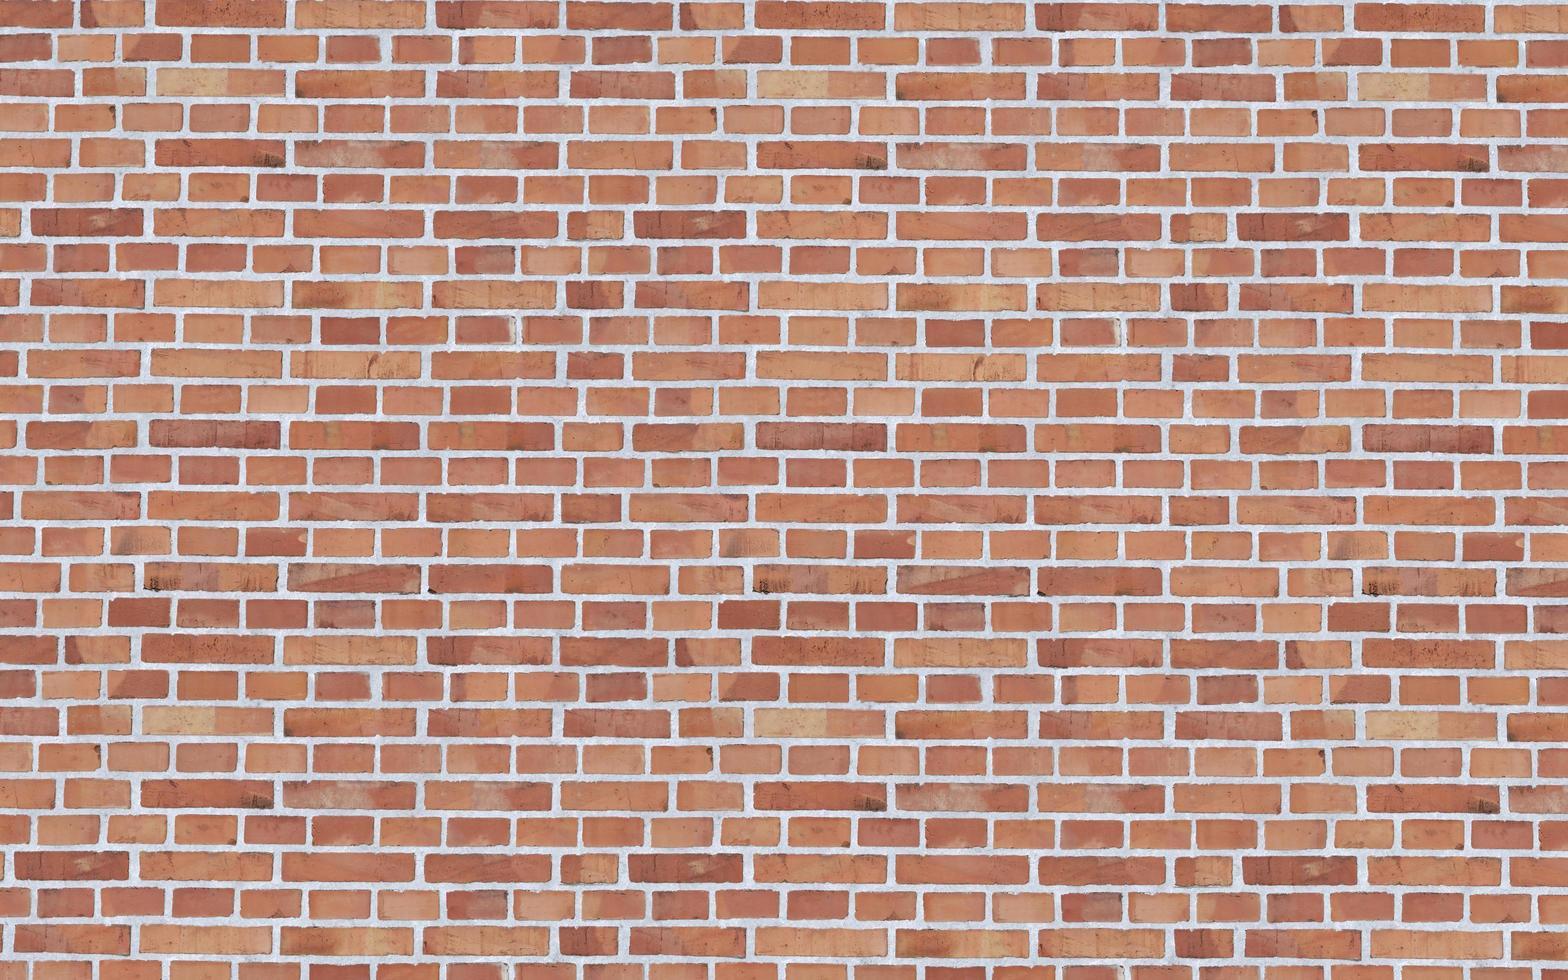 Redbrick wall masonry photo